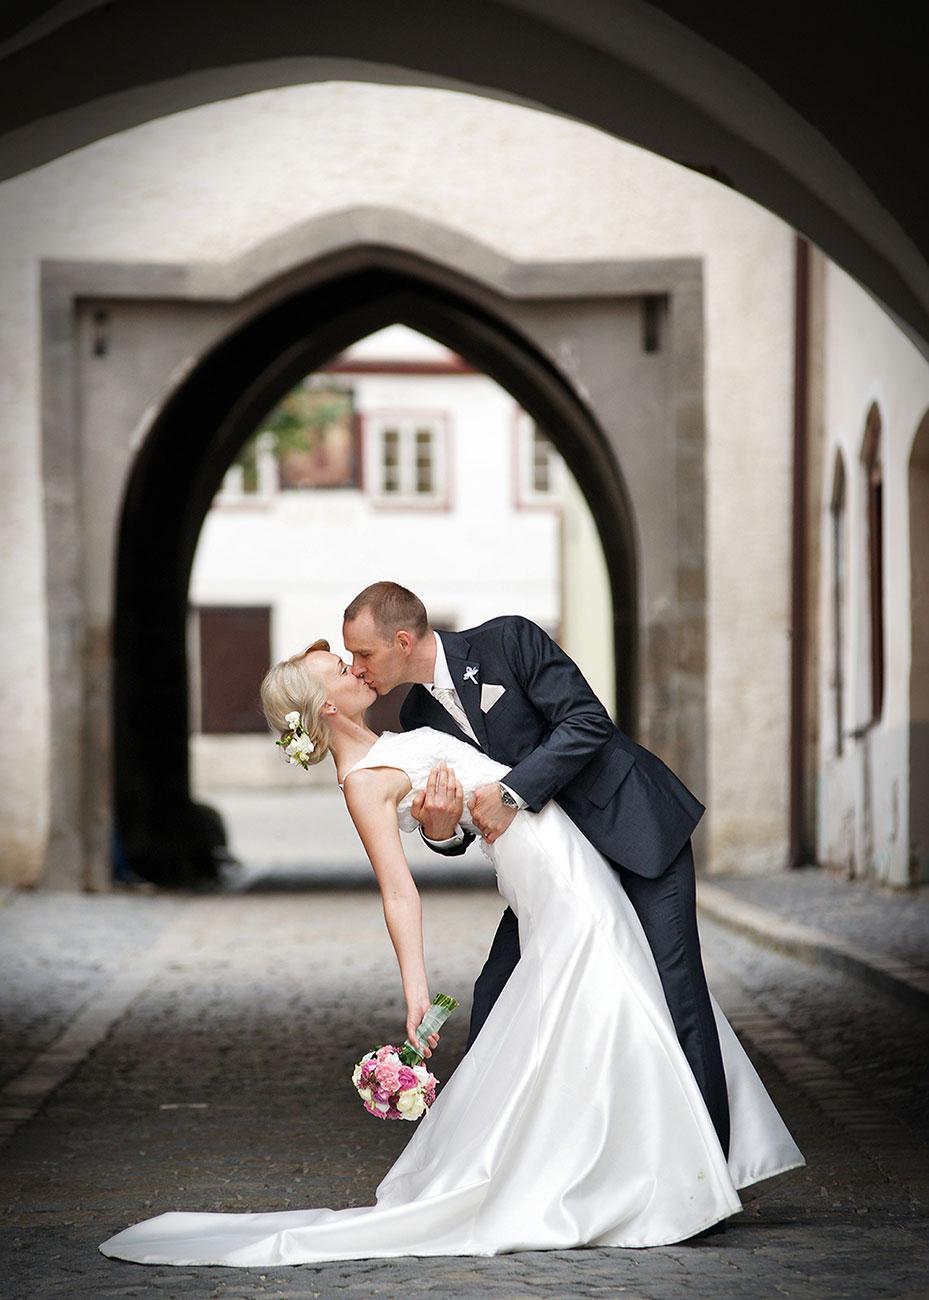 33 svatebni fotografie prachatice cesky krumlov zlata koruna trebon ceske budejovice jihocesky kraj jizni cechy svatebni fotograf lipno nad vltavou potret tehotenske foto svatby 1